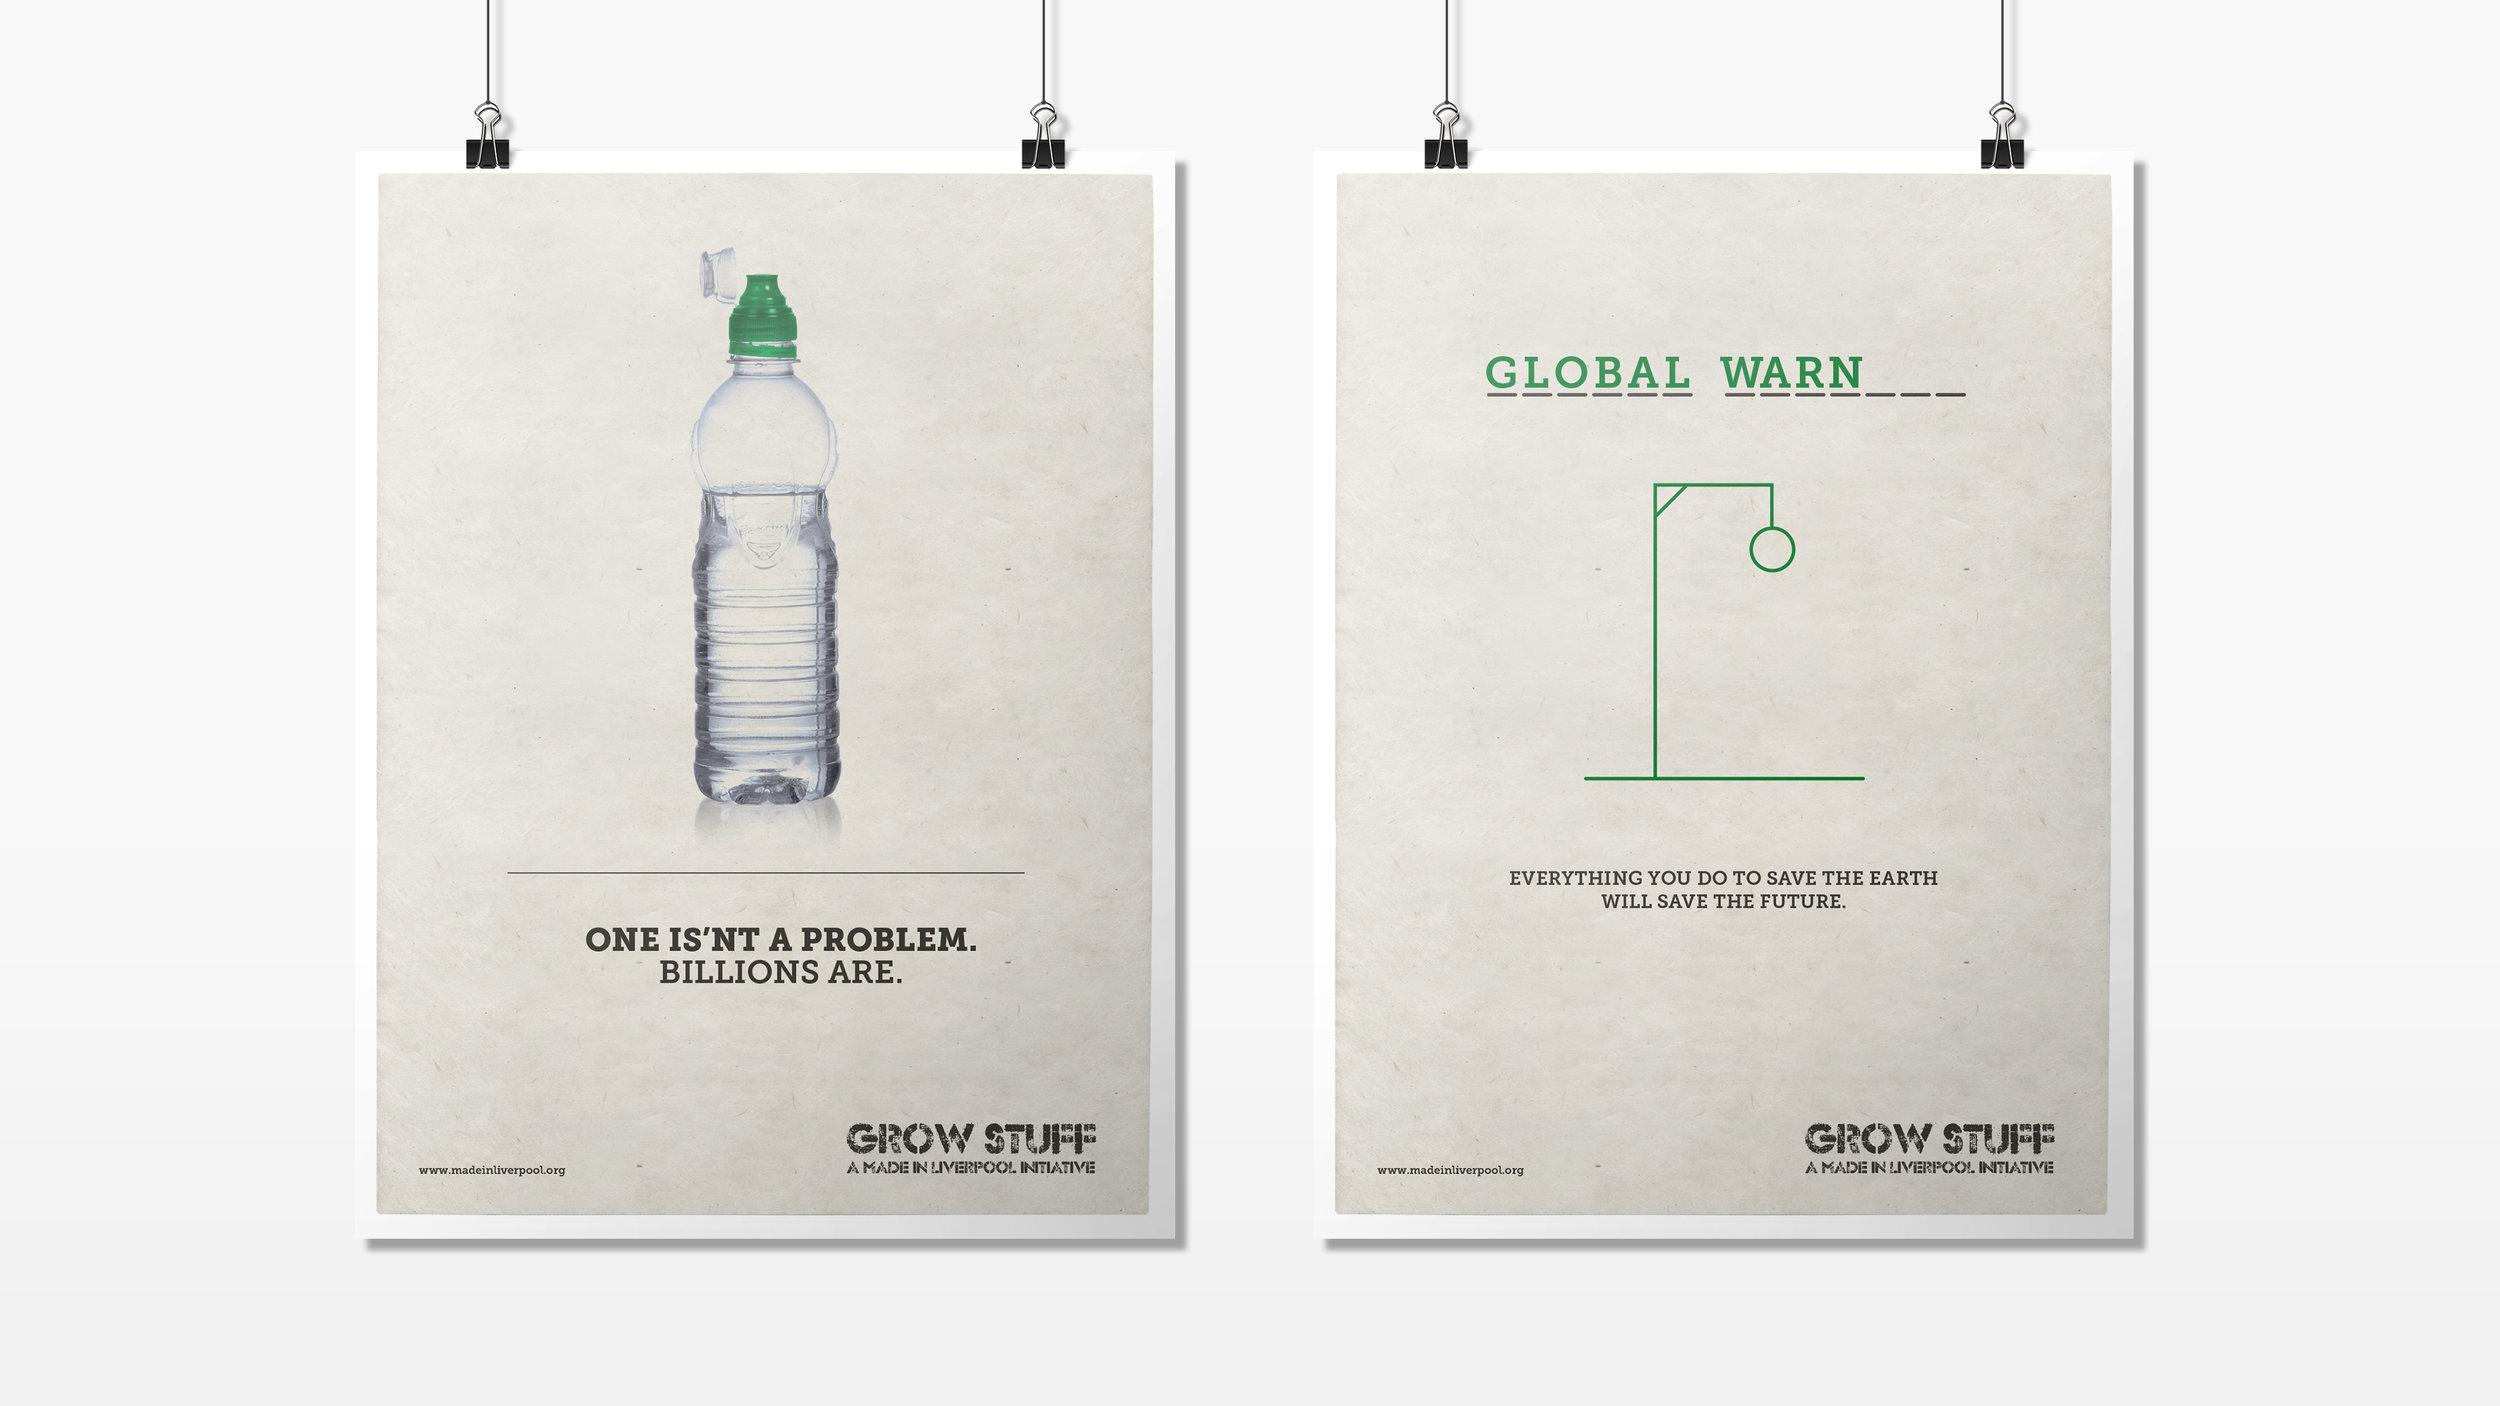 Brand_republica_Made_In_Liverpool_eco_poster_design_02.jpg